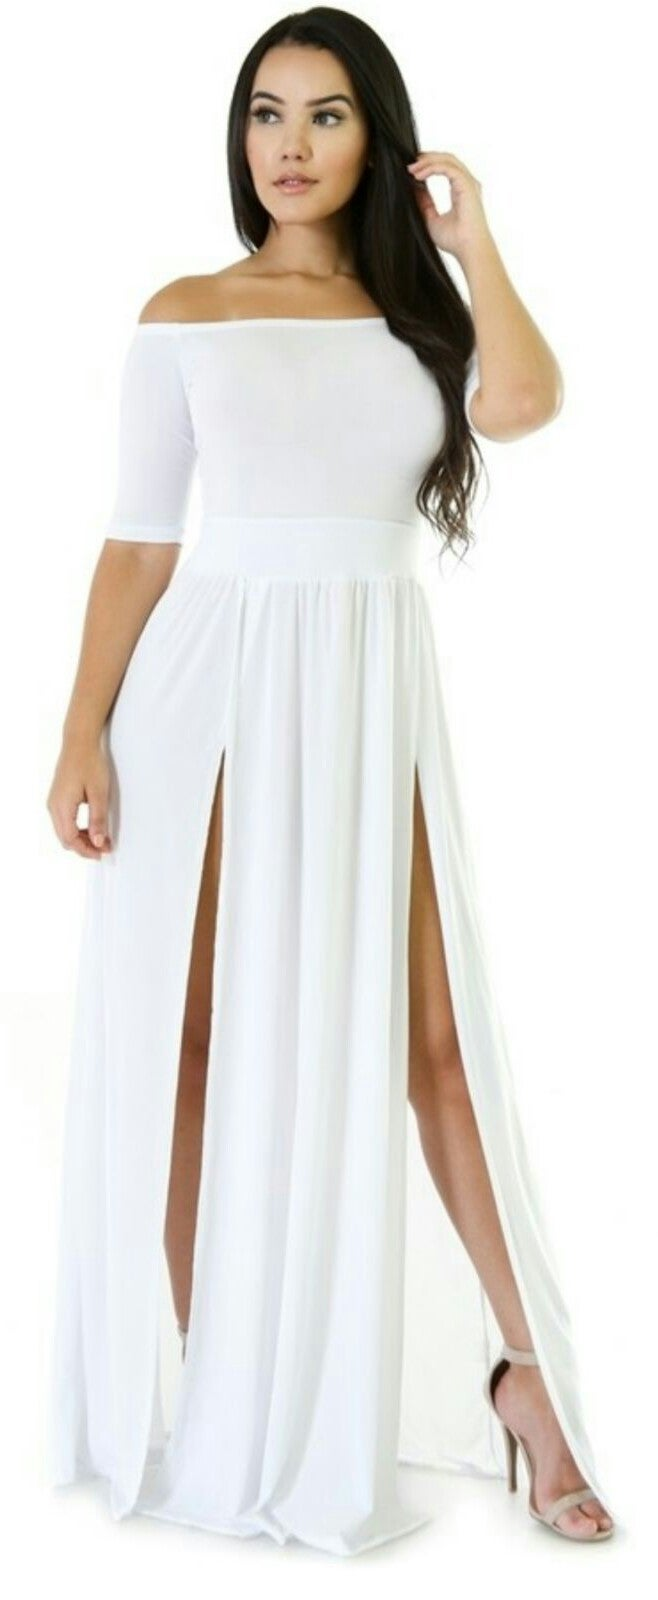 Image of High splits dress